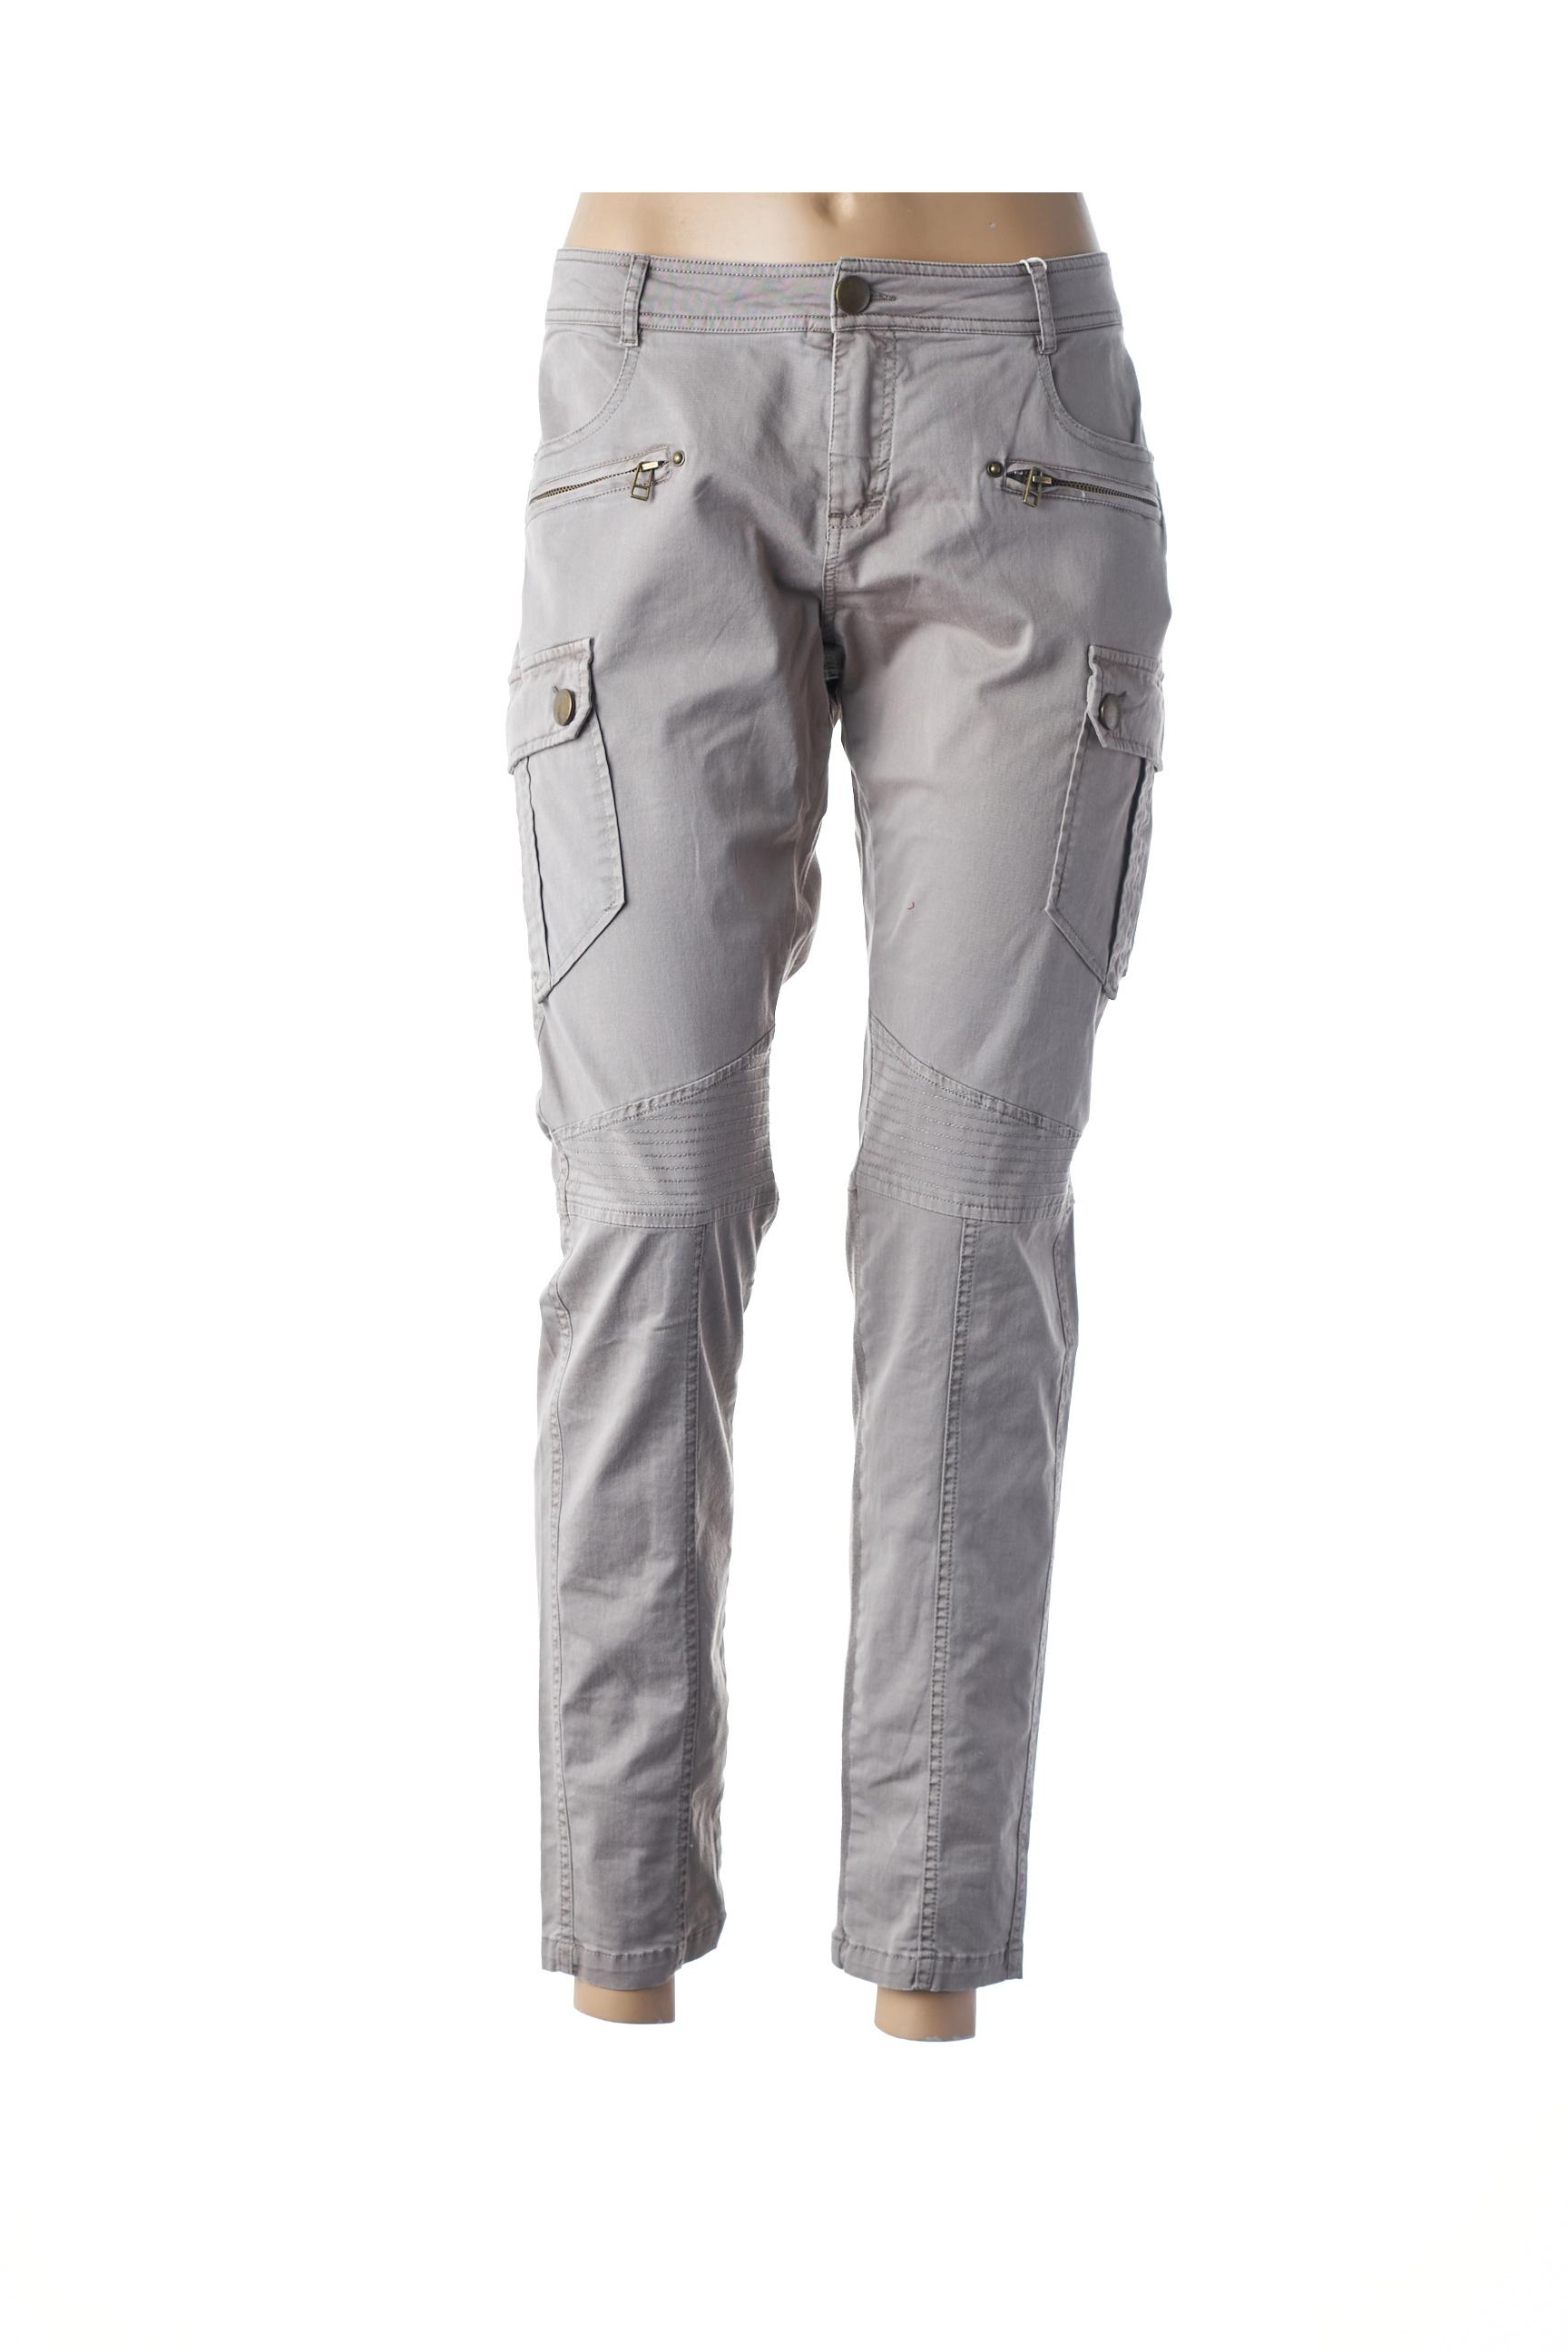 Pantalon casual femme Cream gris taille : 42 49 FR (FR)